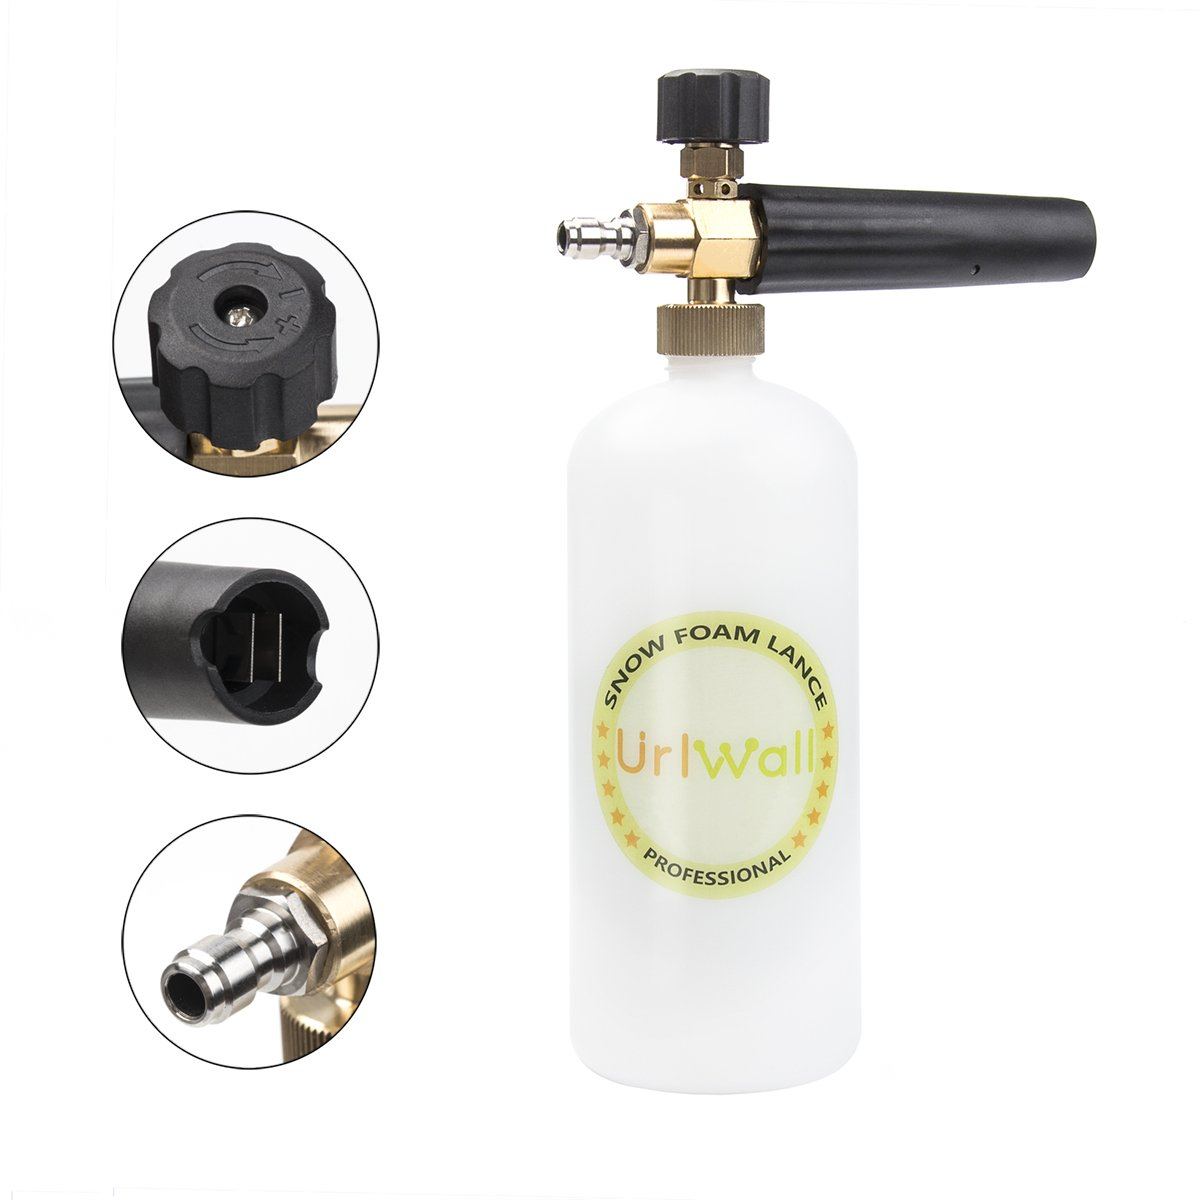 Adjustable Foam Cannon, URLWALL 1 Liter Car Wash Pressure Bottle Snow Foam Lance With 1/4 Quick Connector Foam Blaster for Pressure Washer Gun by URLWALL (Image #2)